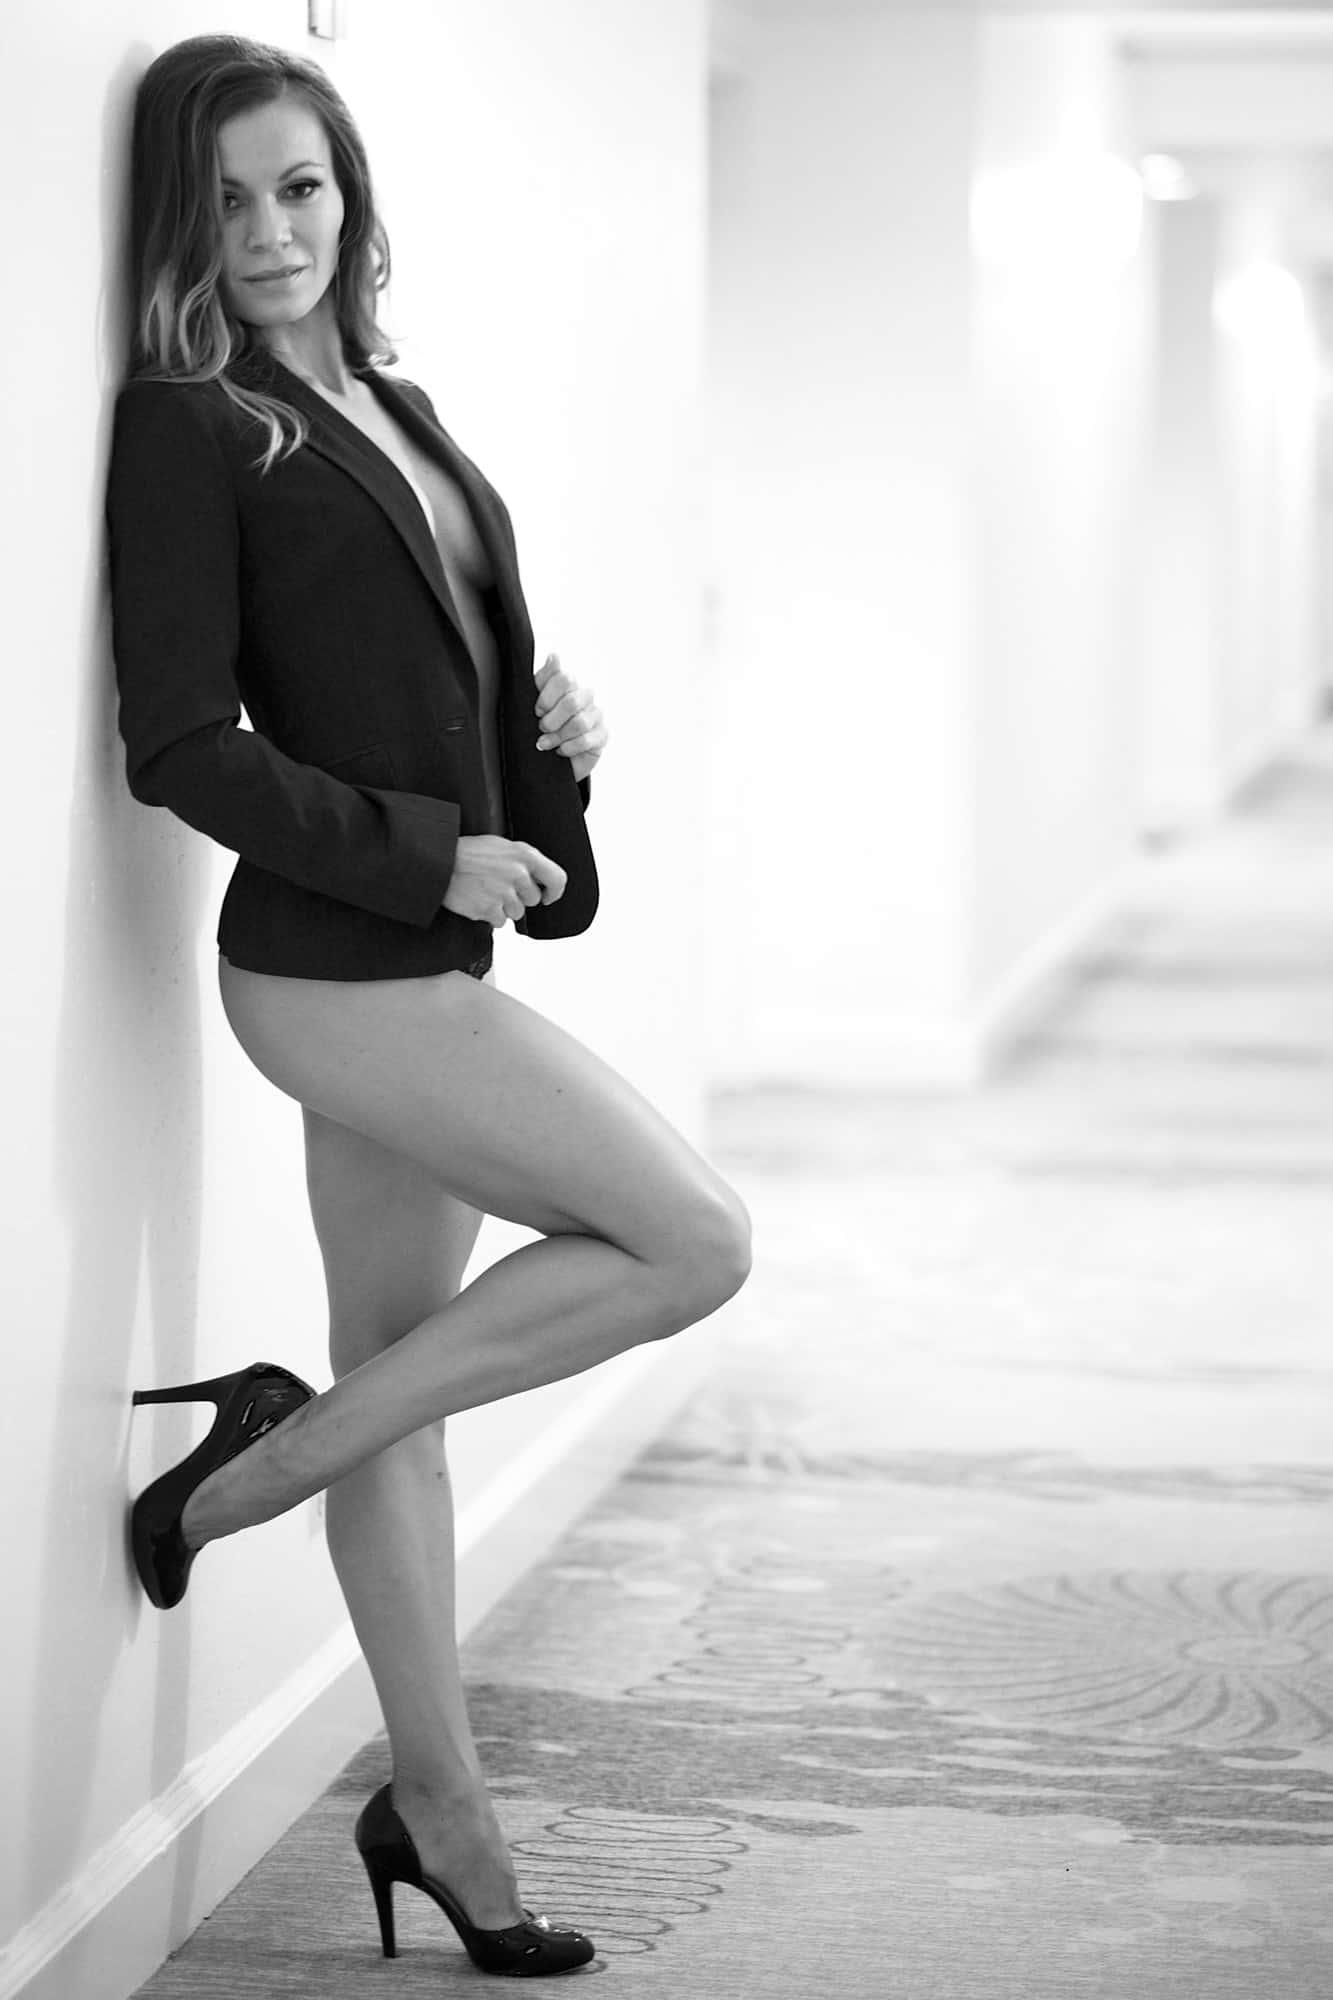 Elegant and Classy Boudoir Photography